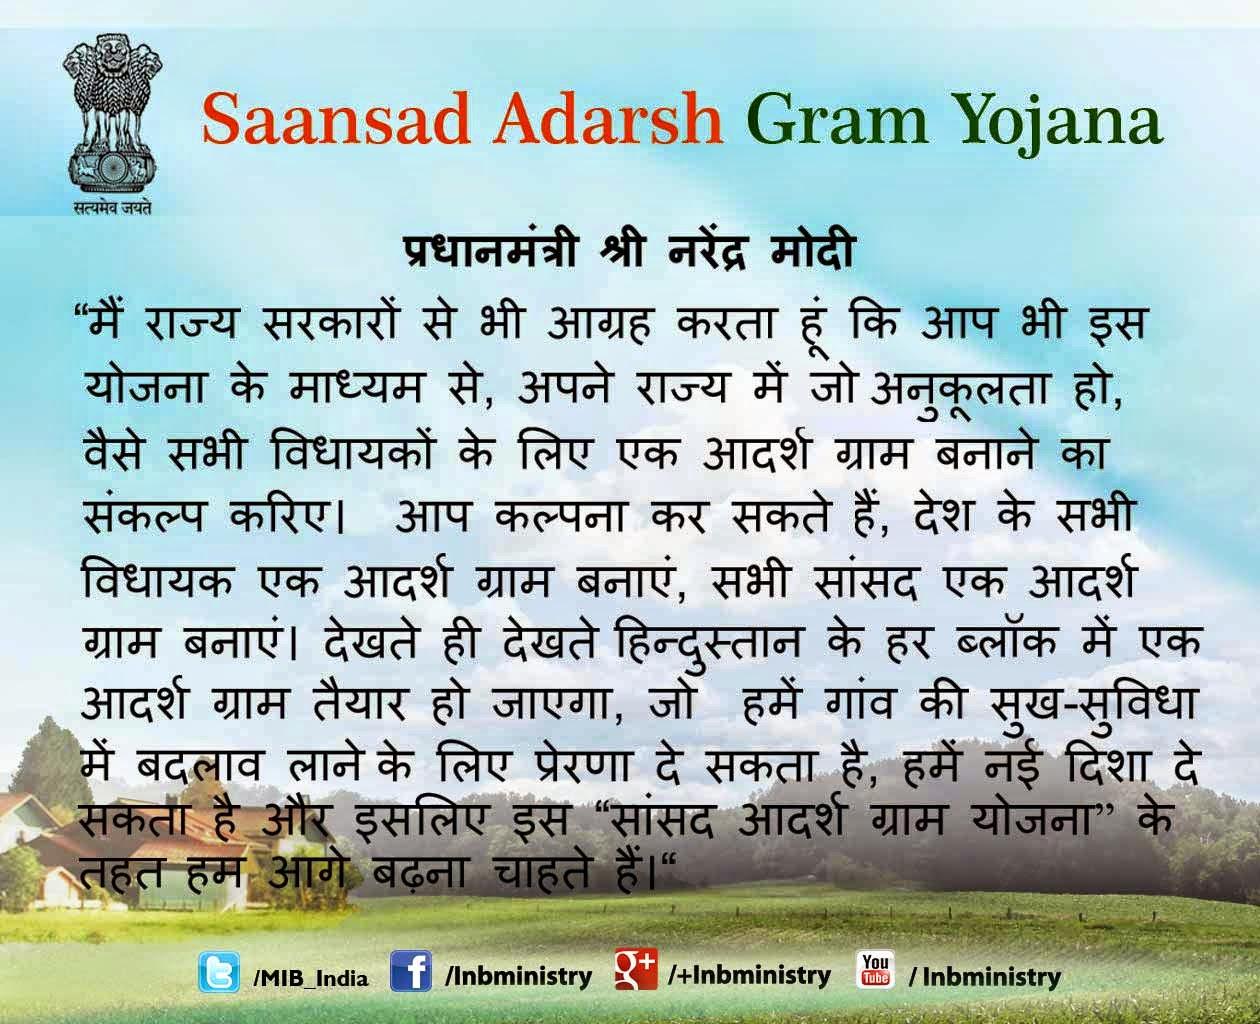 adarsh gaon Saansad adarsh gram yojana (sagy) - objective, approach, outcome and sustainability etc list of villages adopted by mp under sansad adarsh gram yojana.